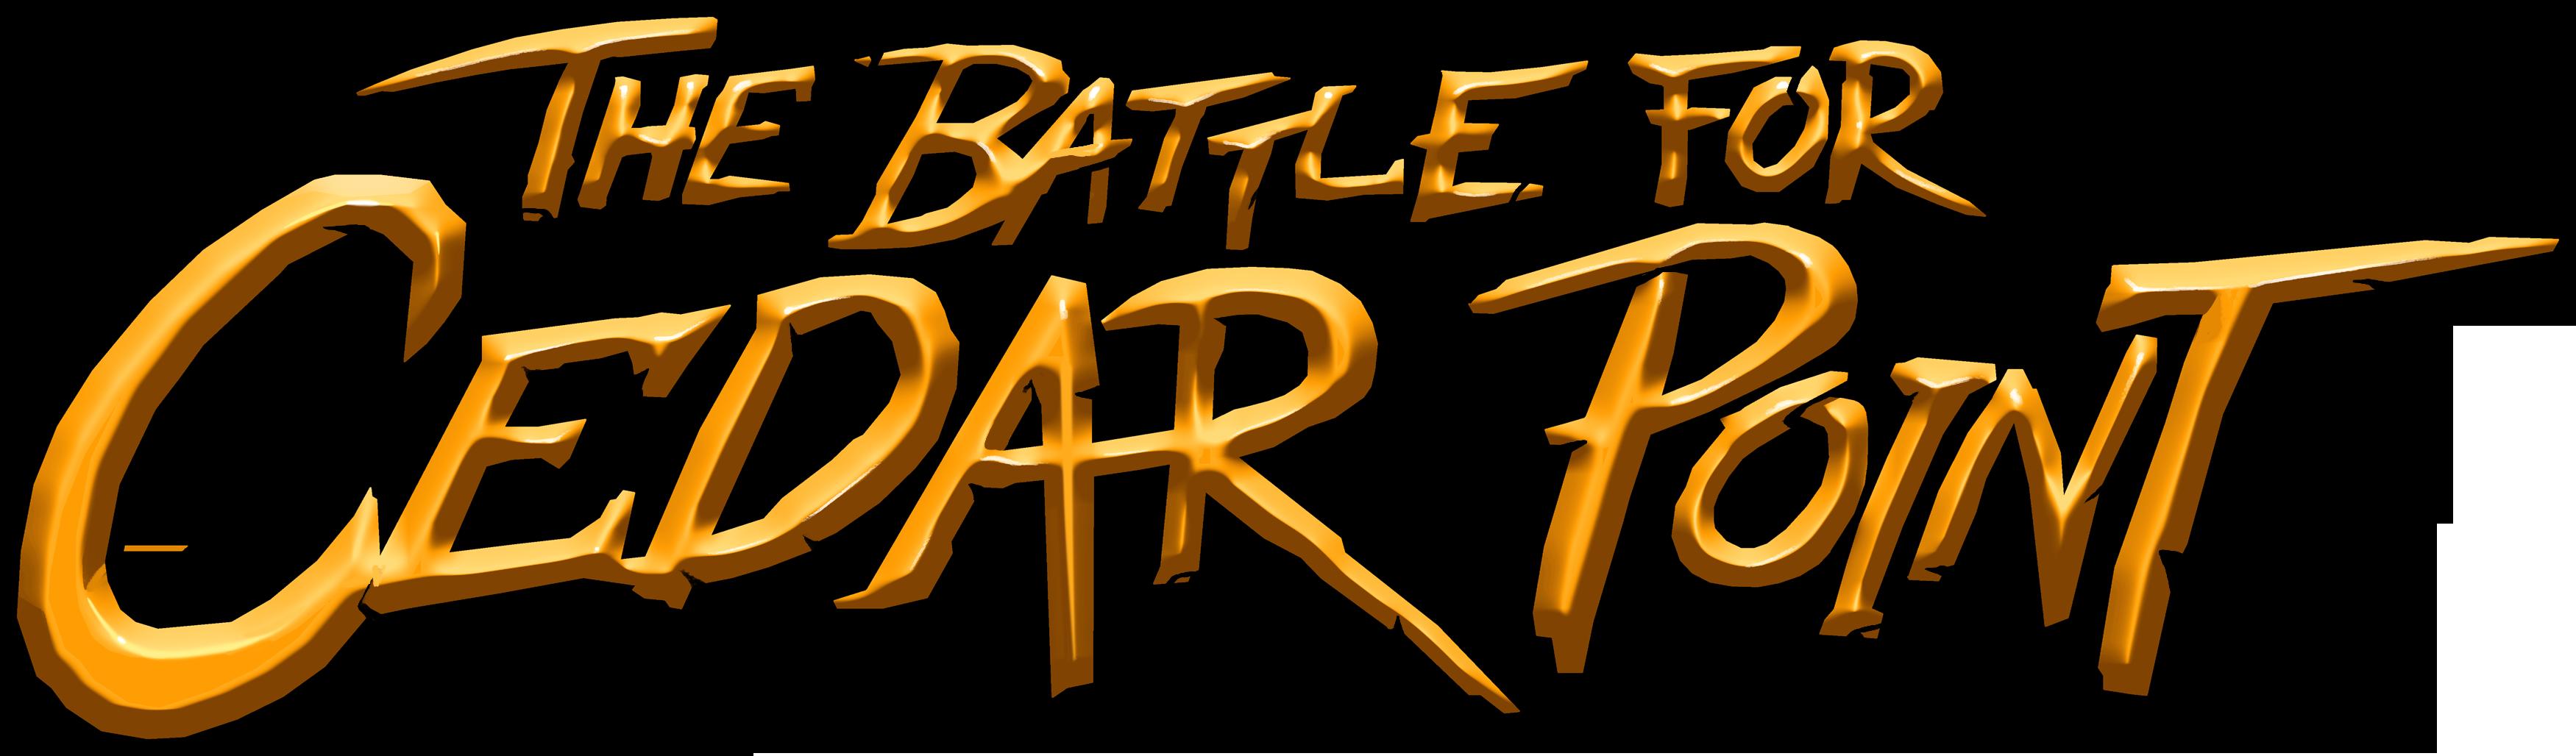 TheBattleForCedarPoint_Logo